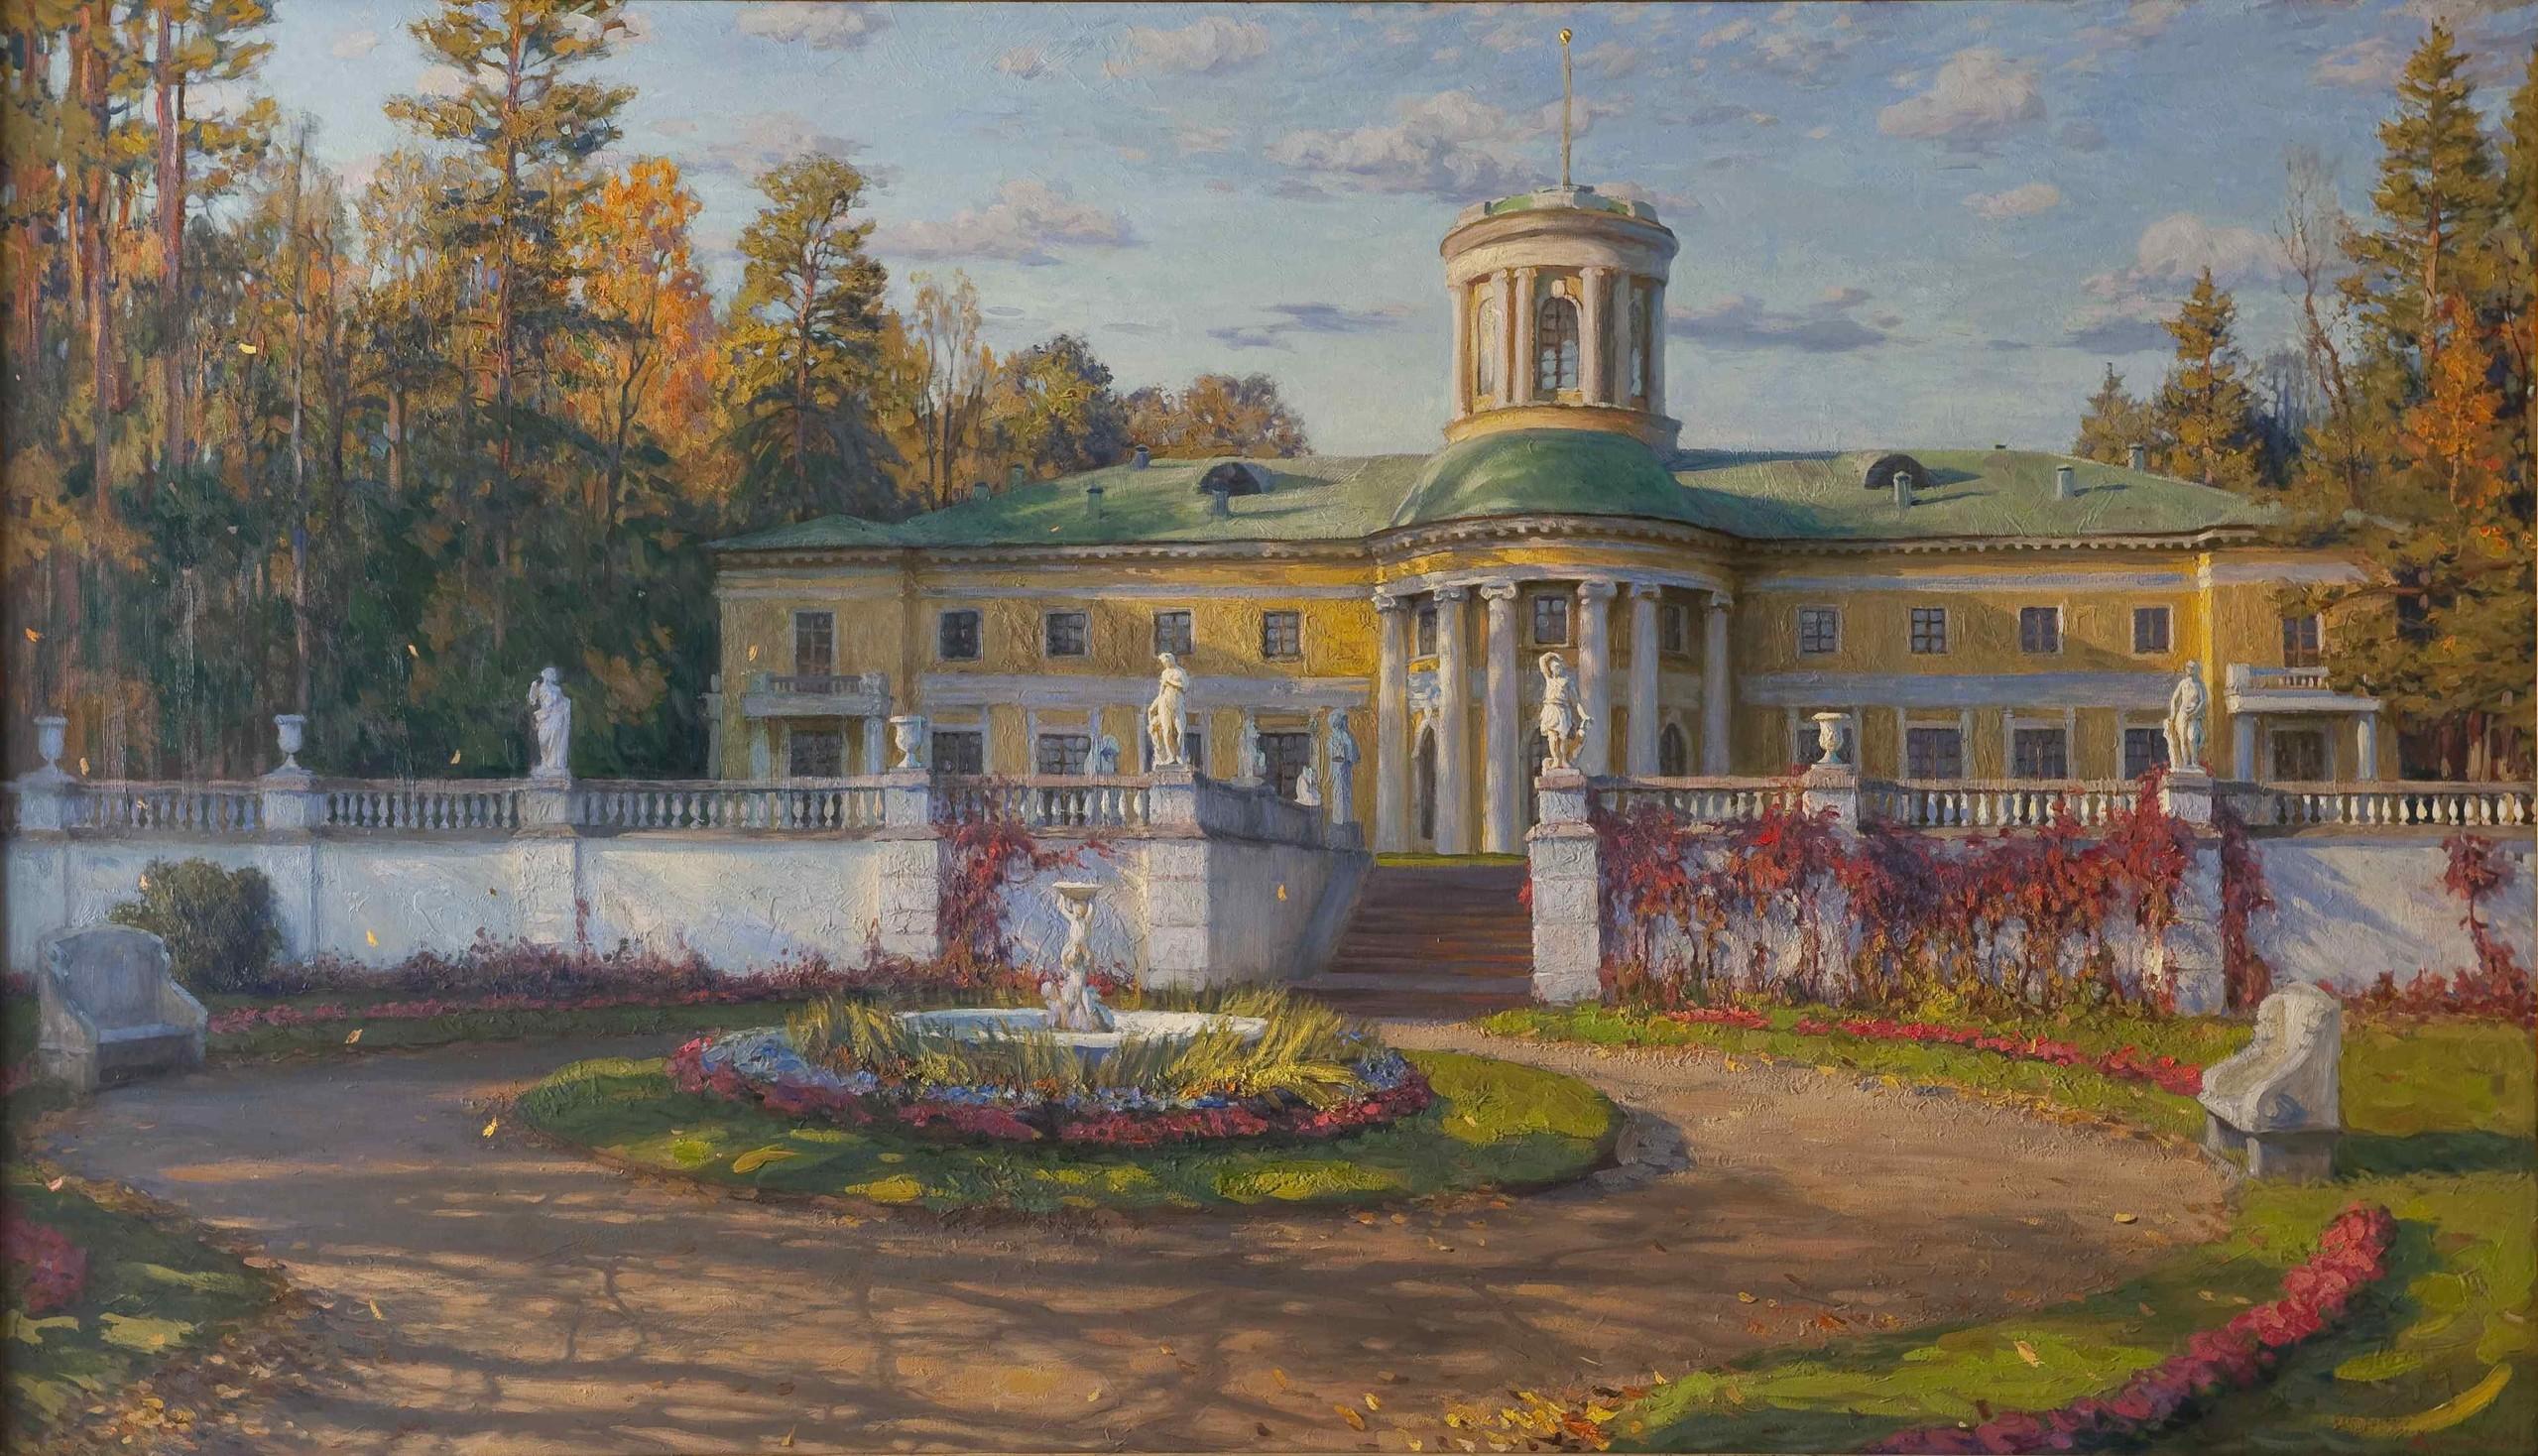 http://www.artlib.ru/objects/gallery_514/artlib_gallery-257008-o.jpg